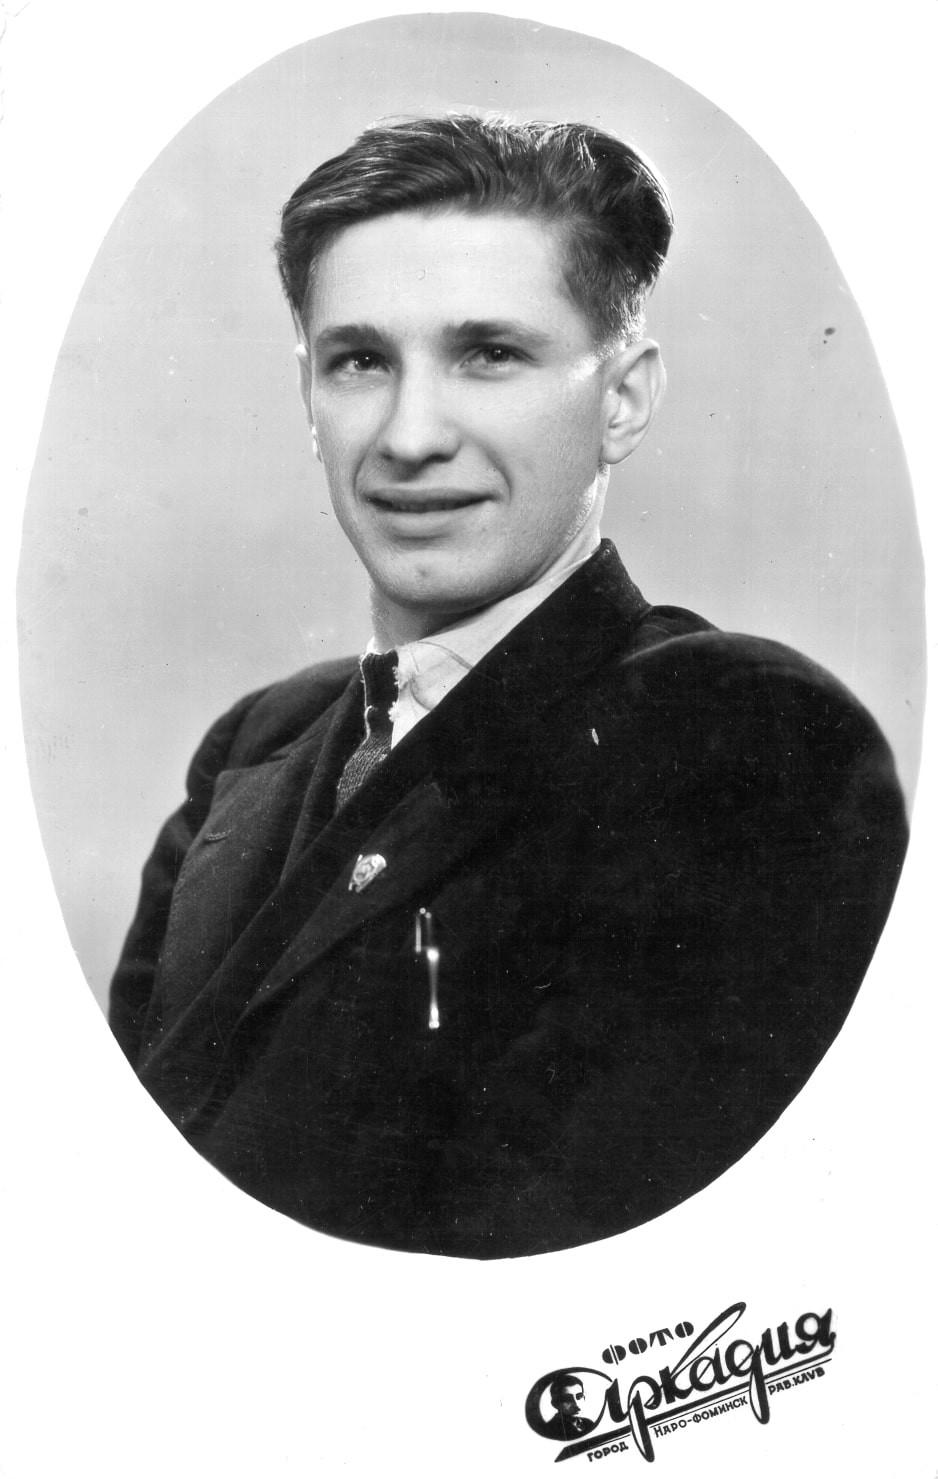 Gena, 1948